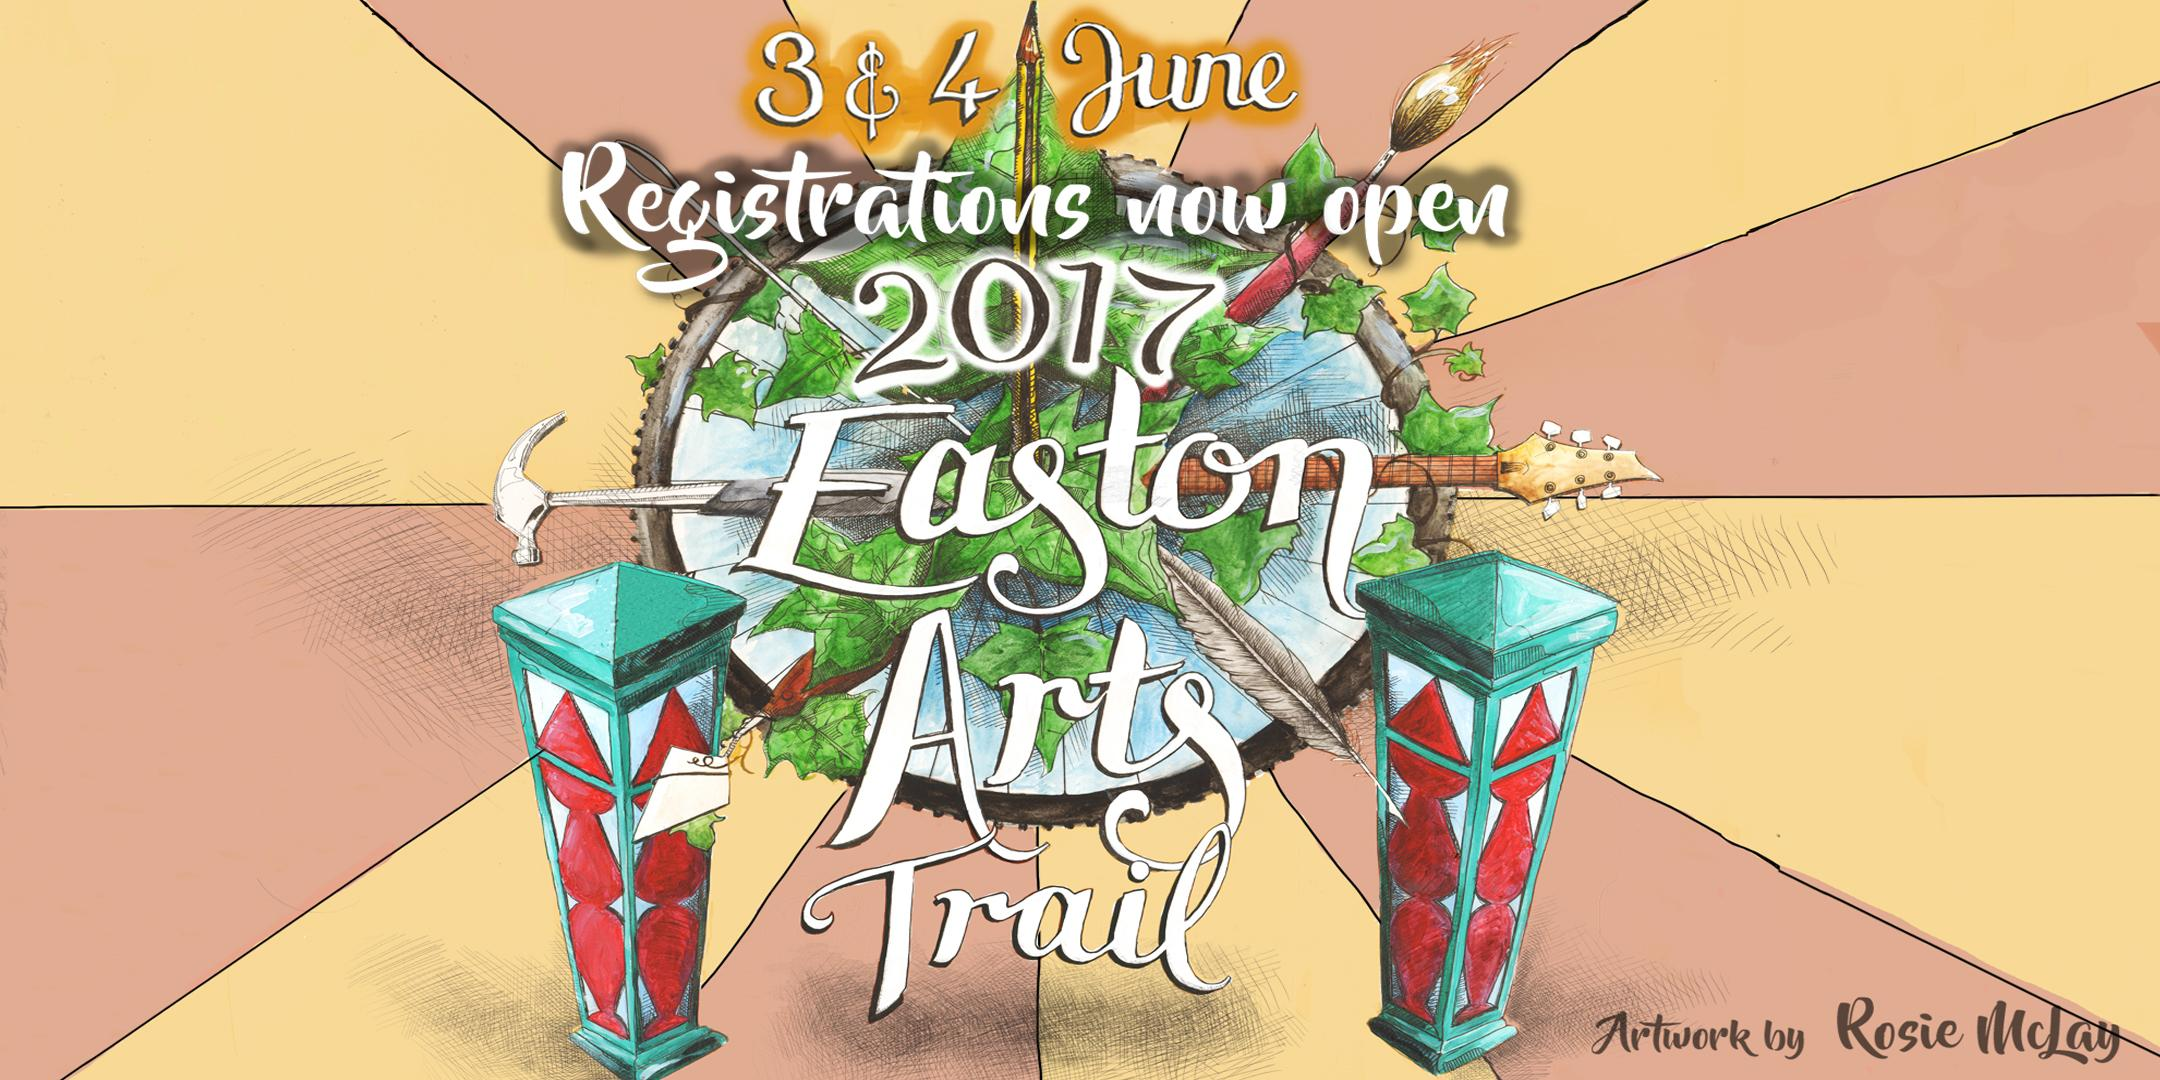 Easton Arts Trail